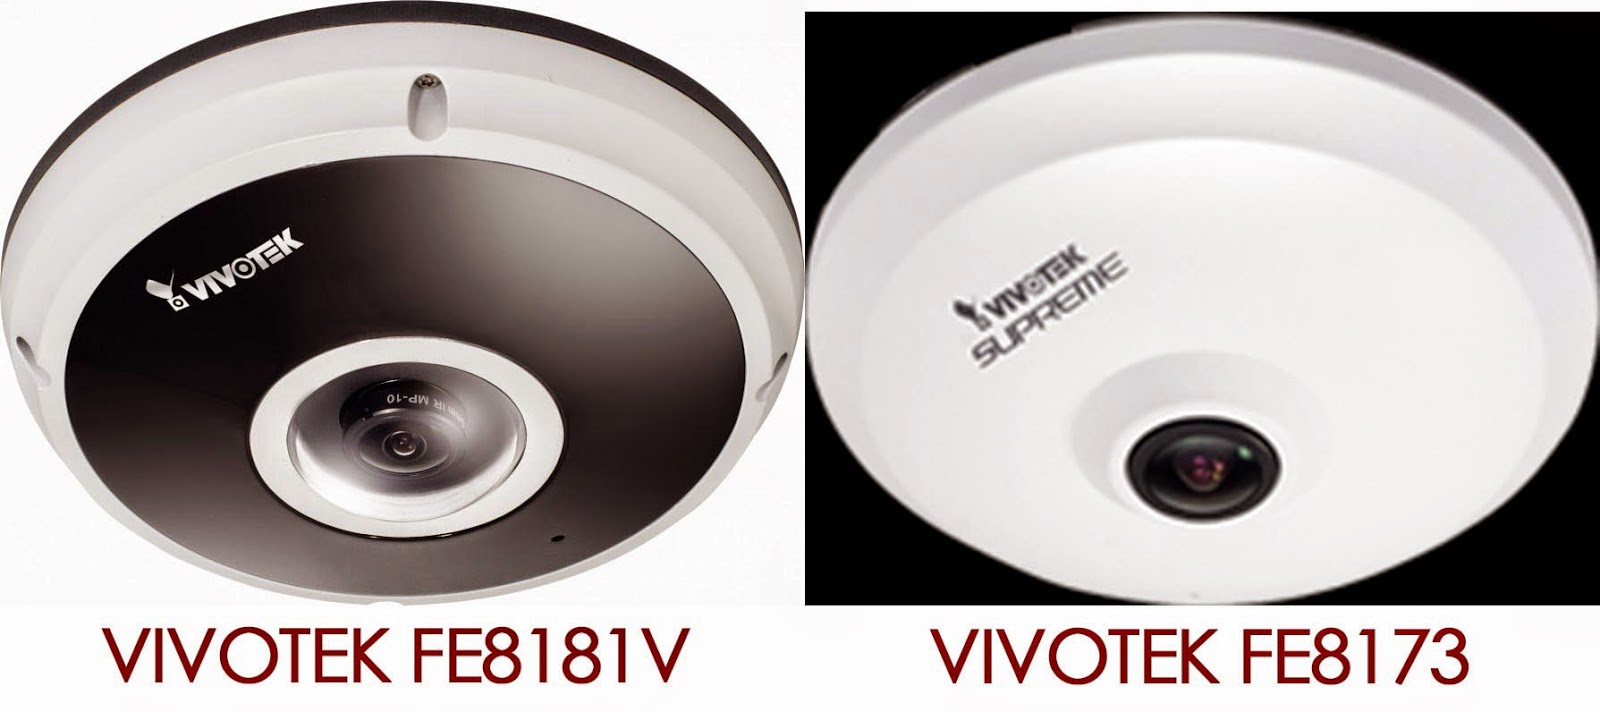 Iwatchs Holding Sdn Bhd- Vivotek CCTV Distributor